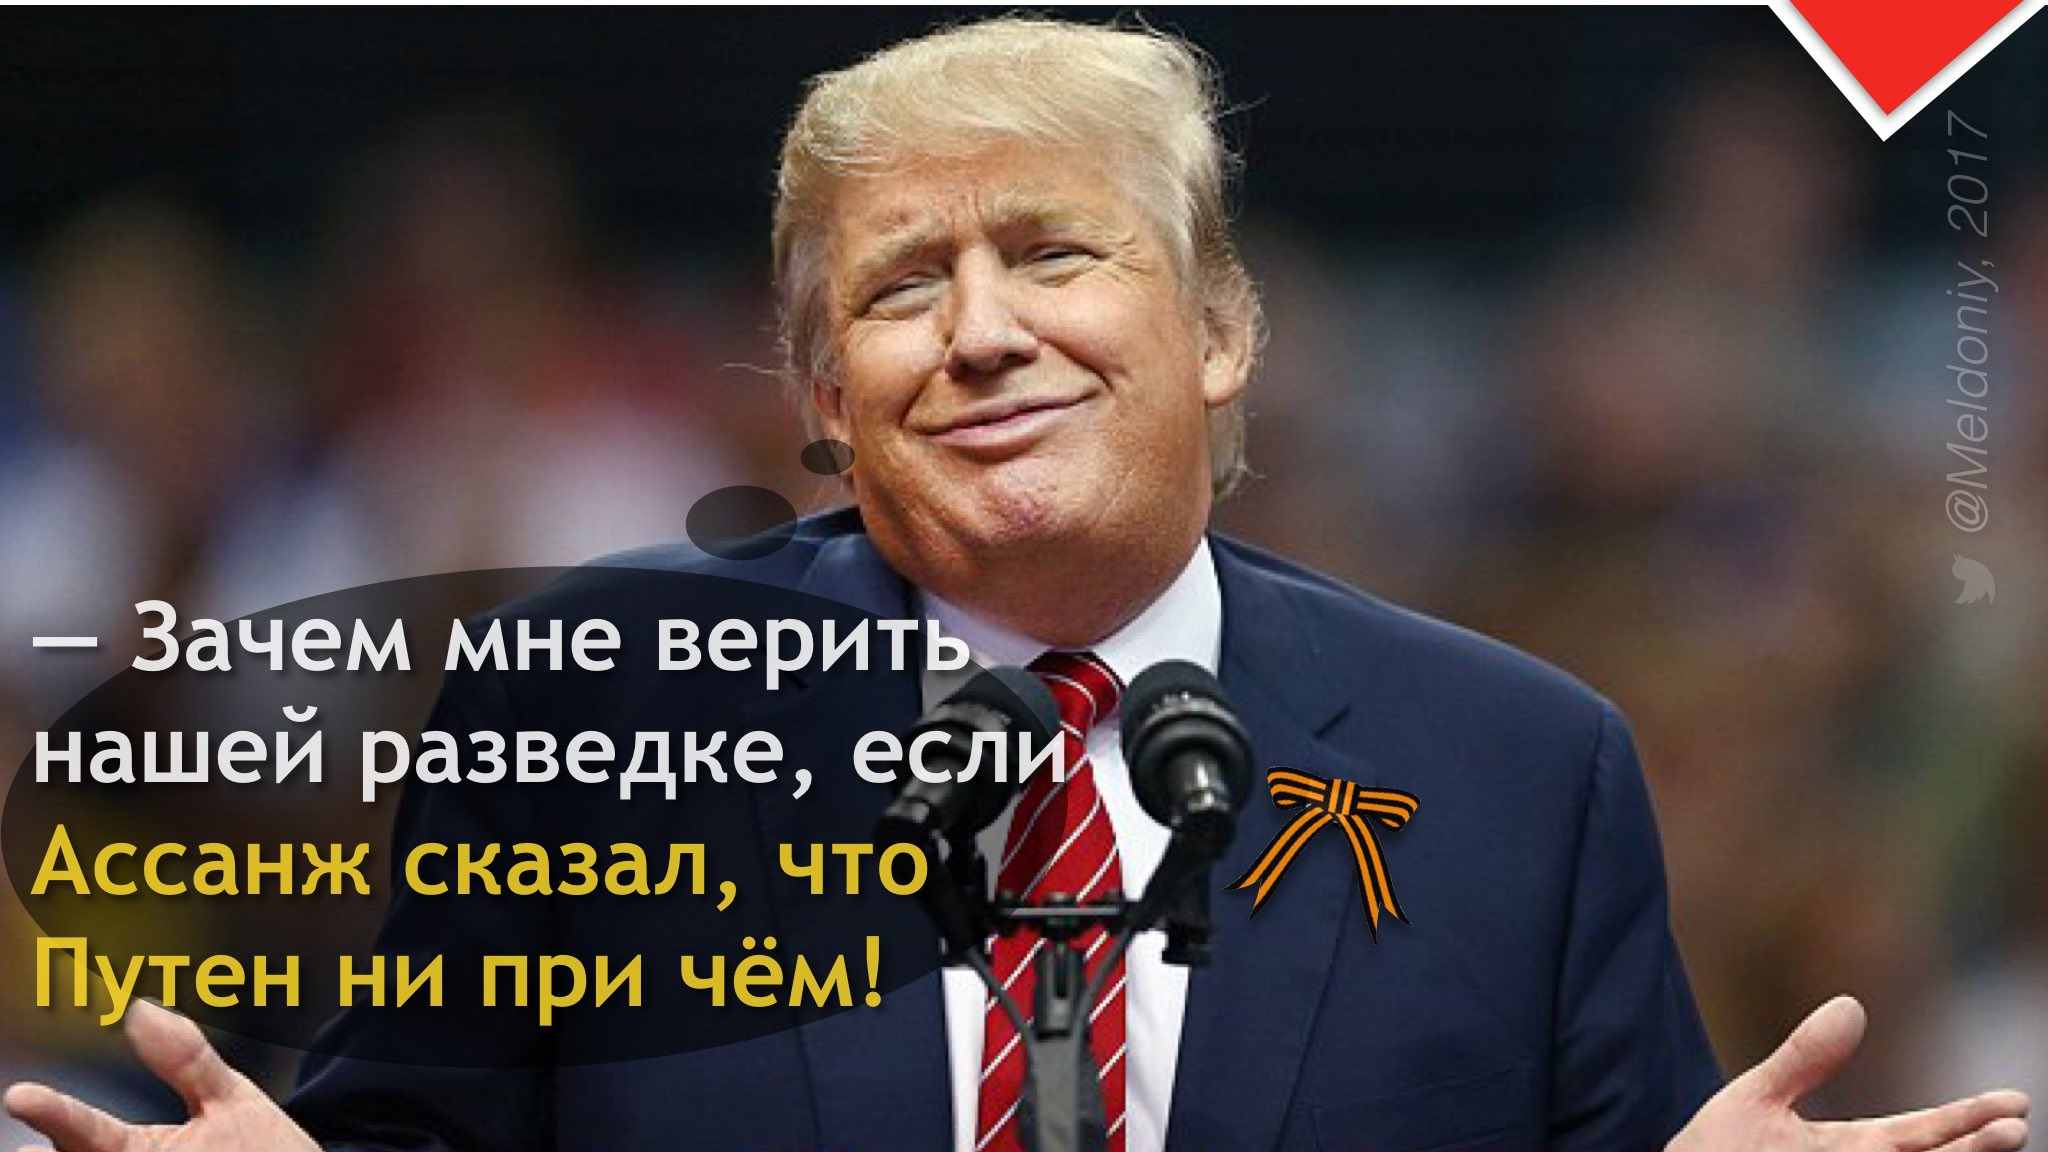 #трамп